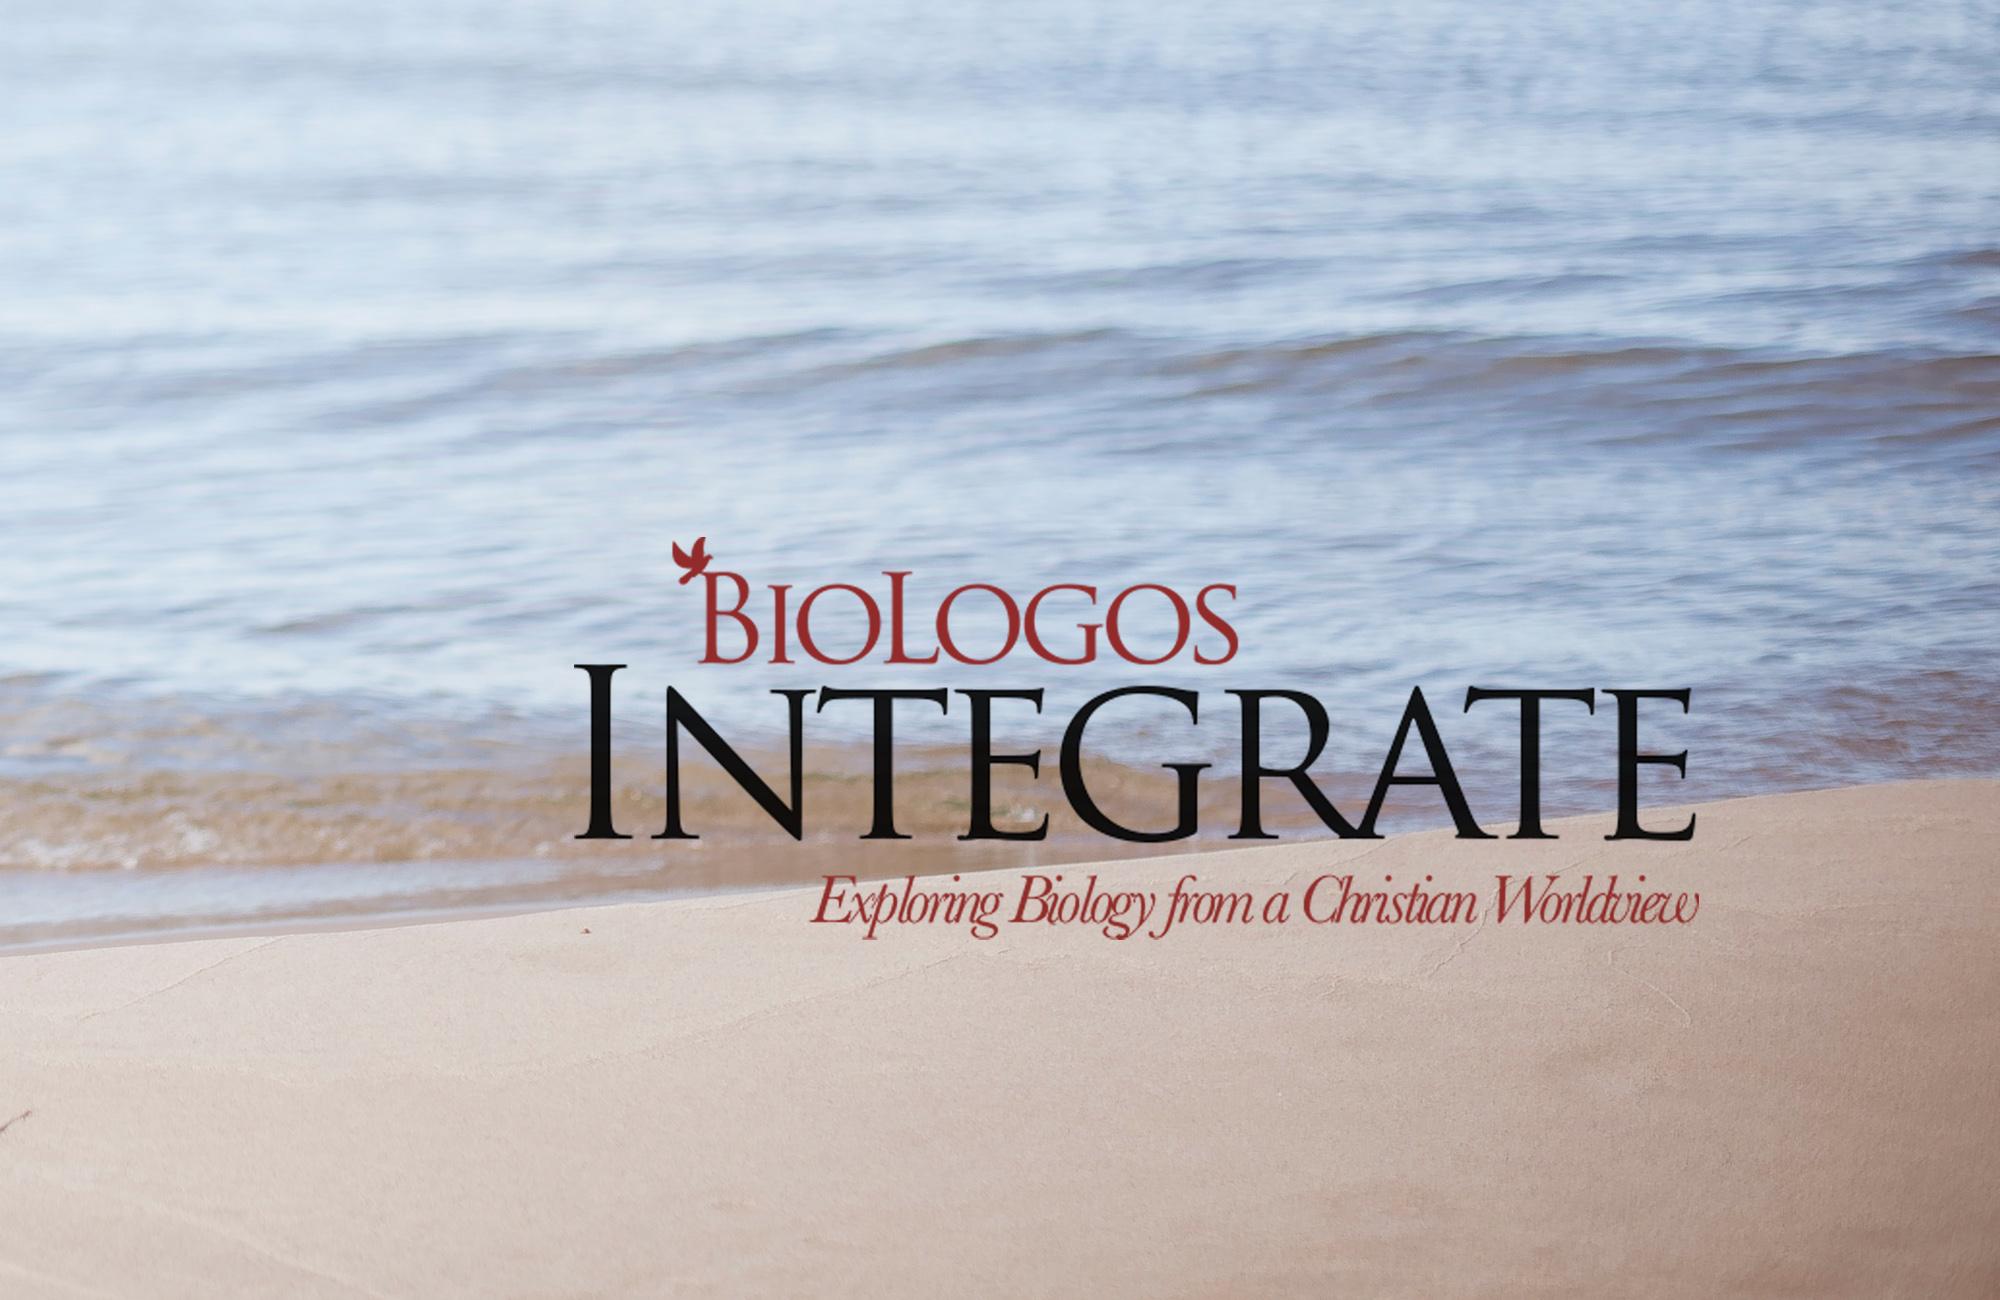 BioLogos Integrate